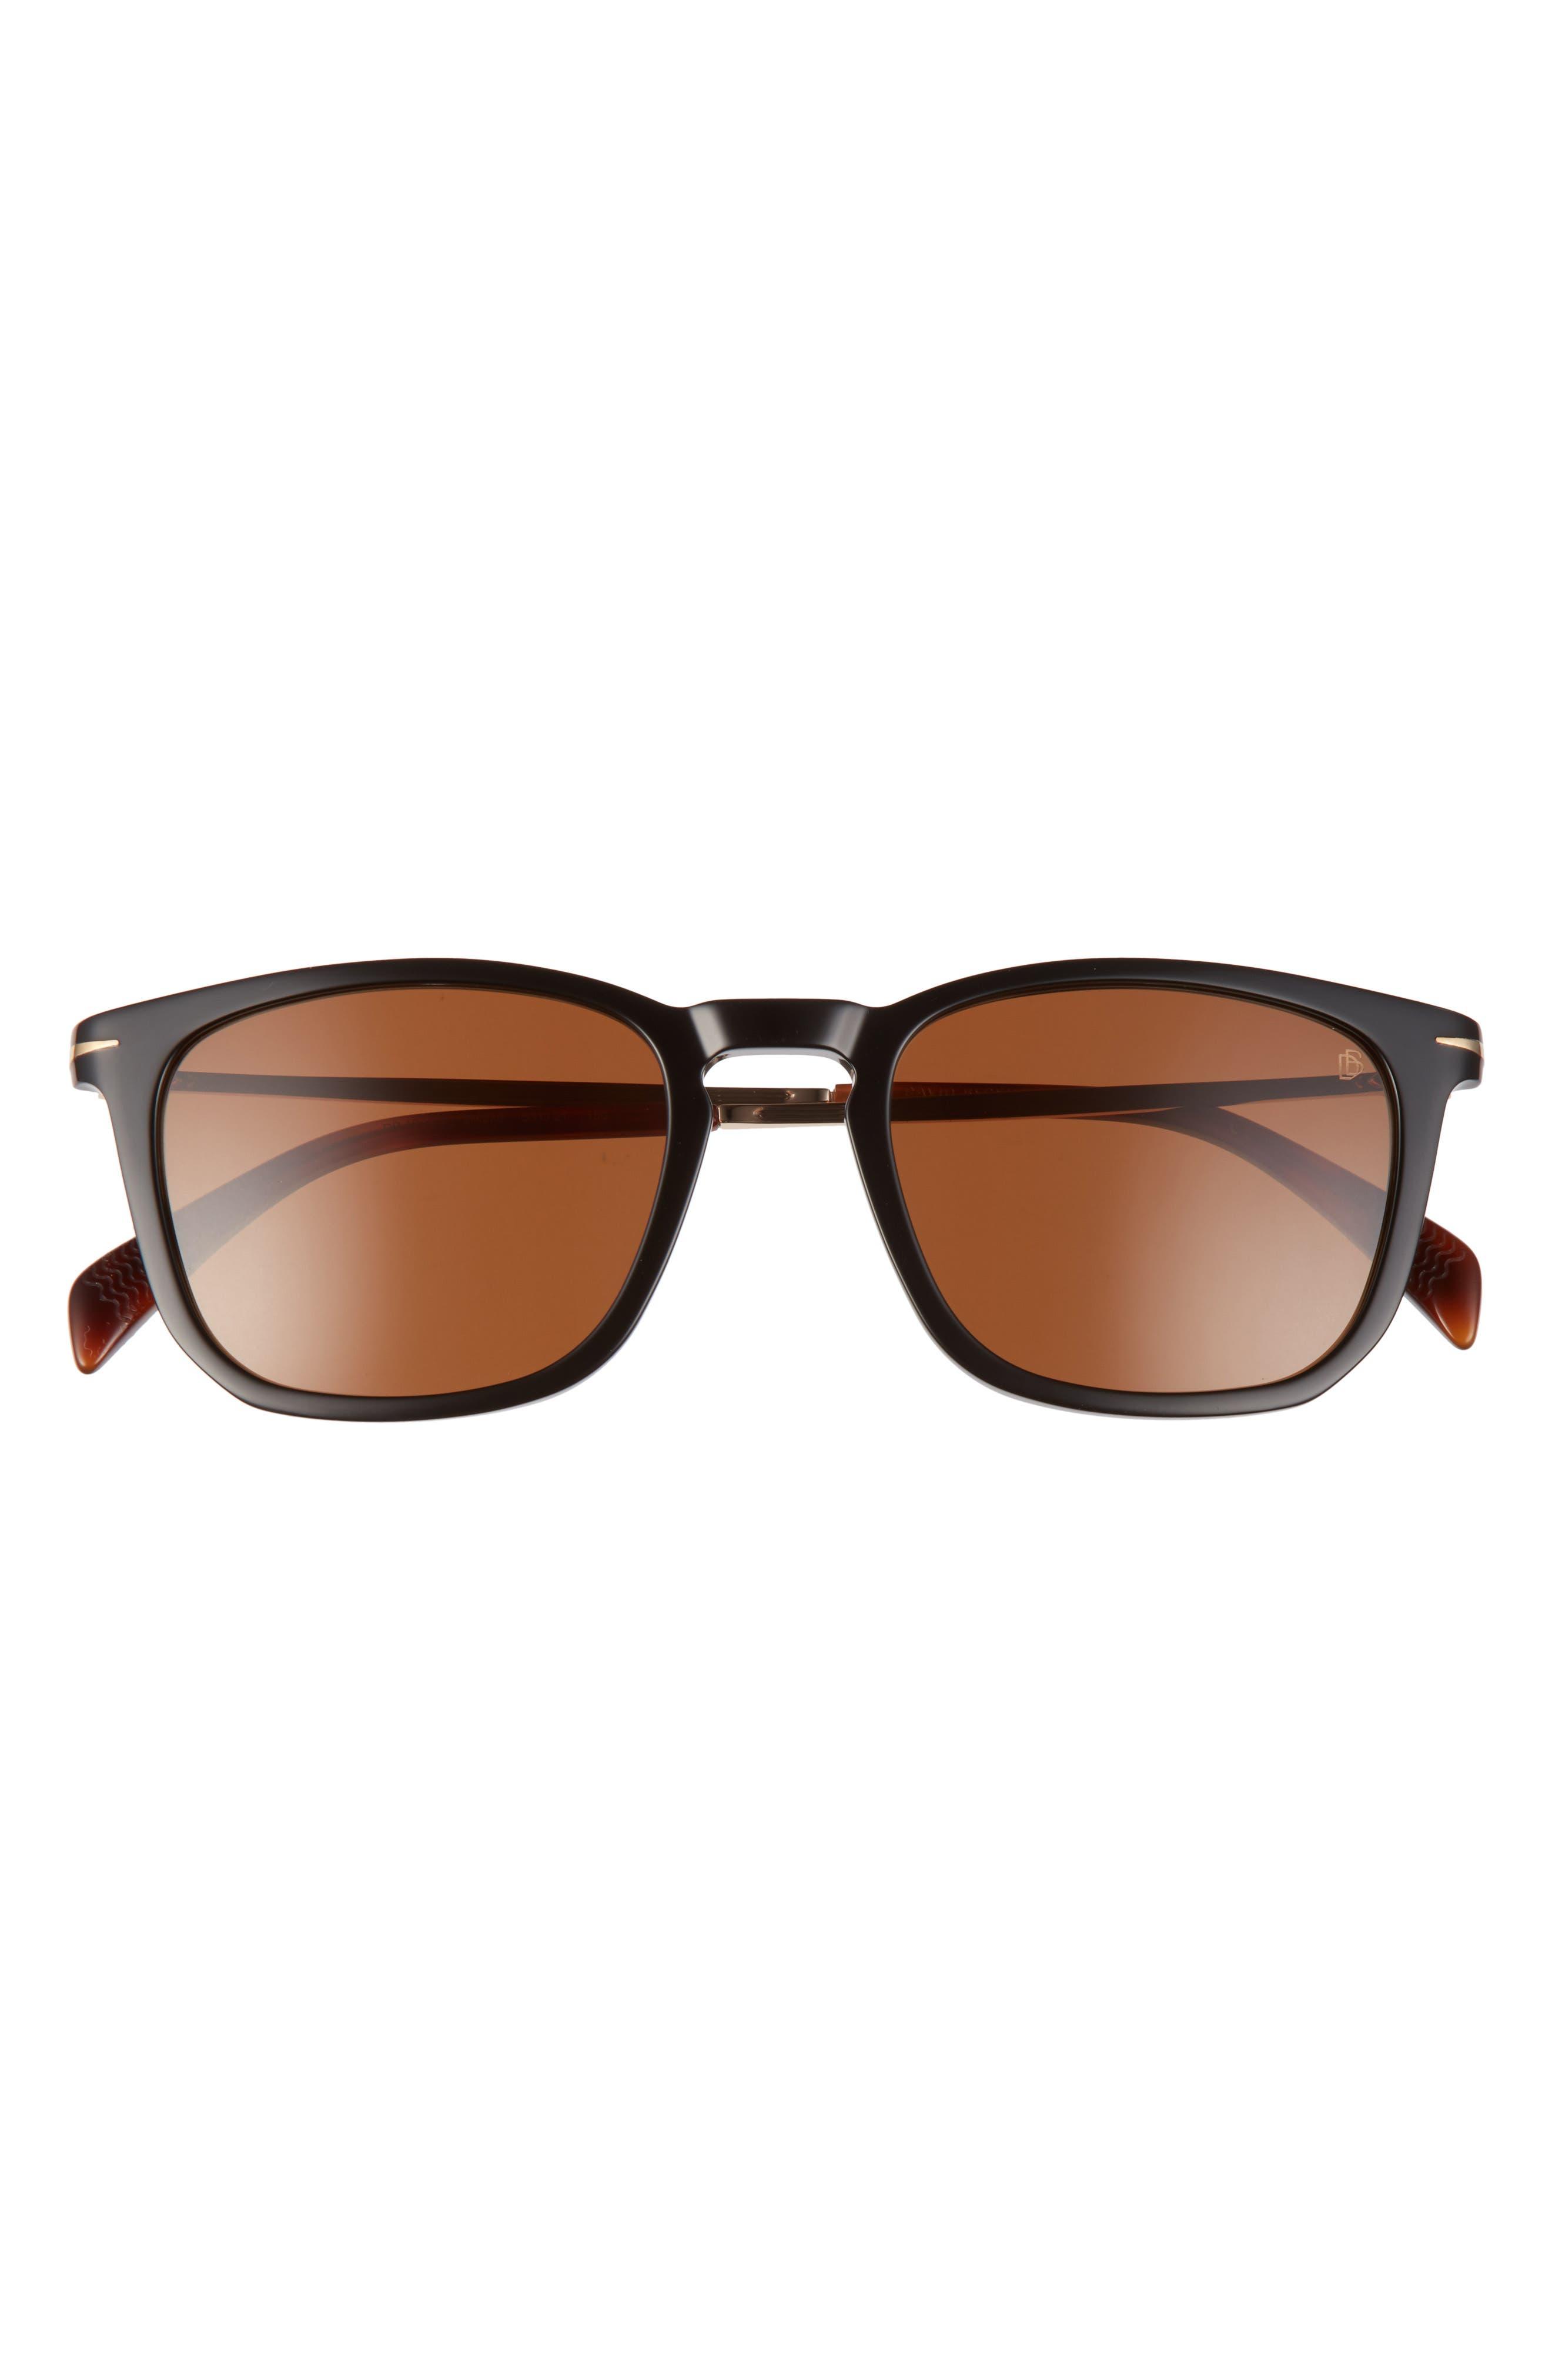 Men's Eyewear By David Beckham 53mm Rectangular Sunglasses